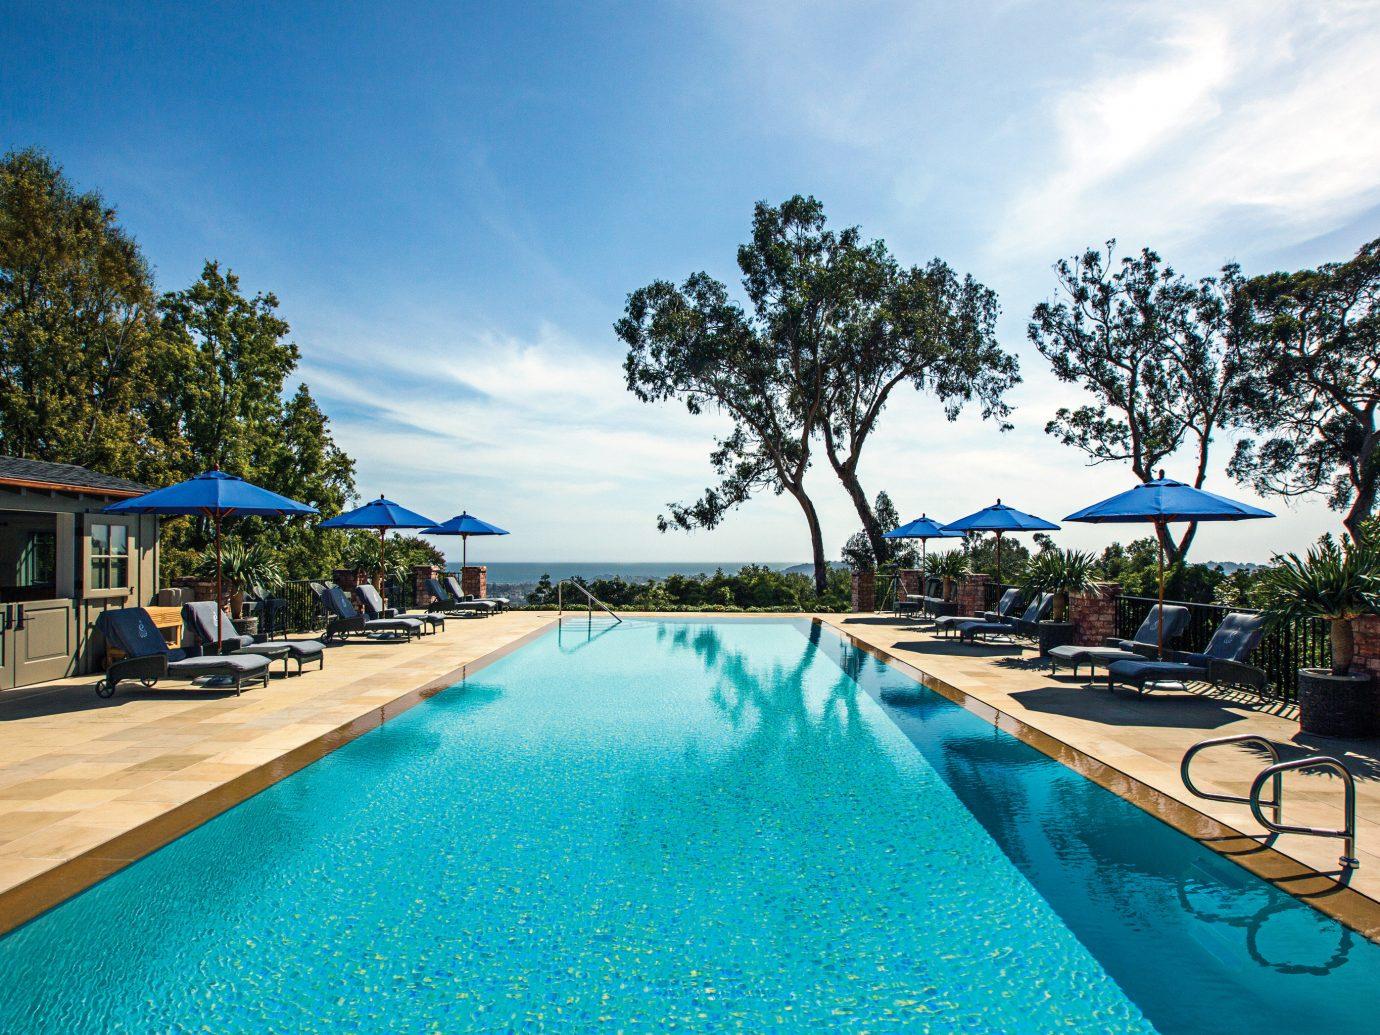 Hotels Play Pool Resort Trip Ideas sky outdoor tree swimming pool leisure property vacation estate blue resort town Sea real estate Villa bay caribbean shore swimming